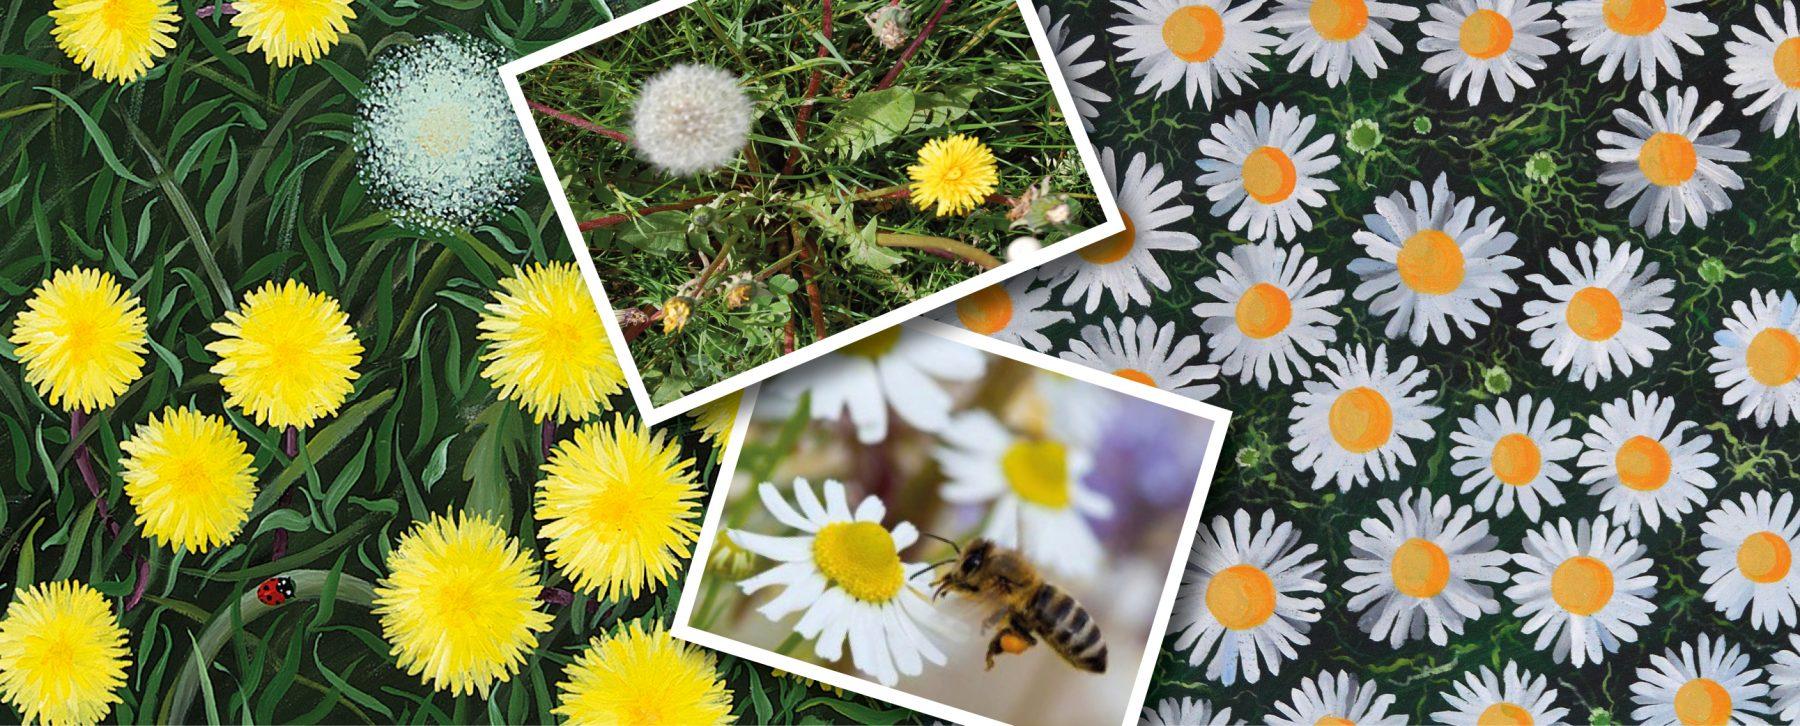 Billedserien: Vores natur